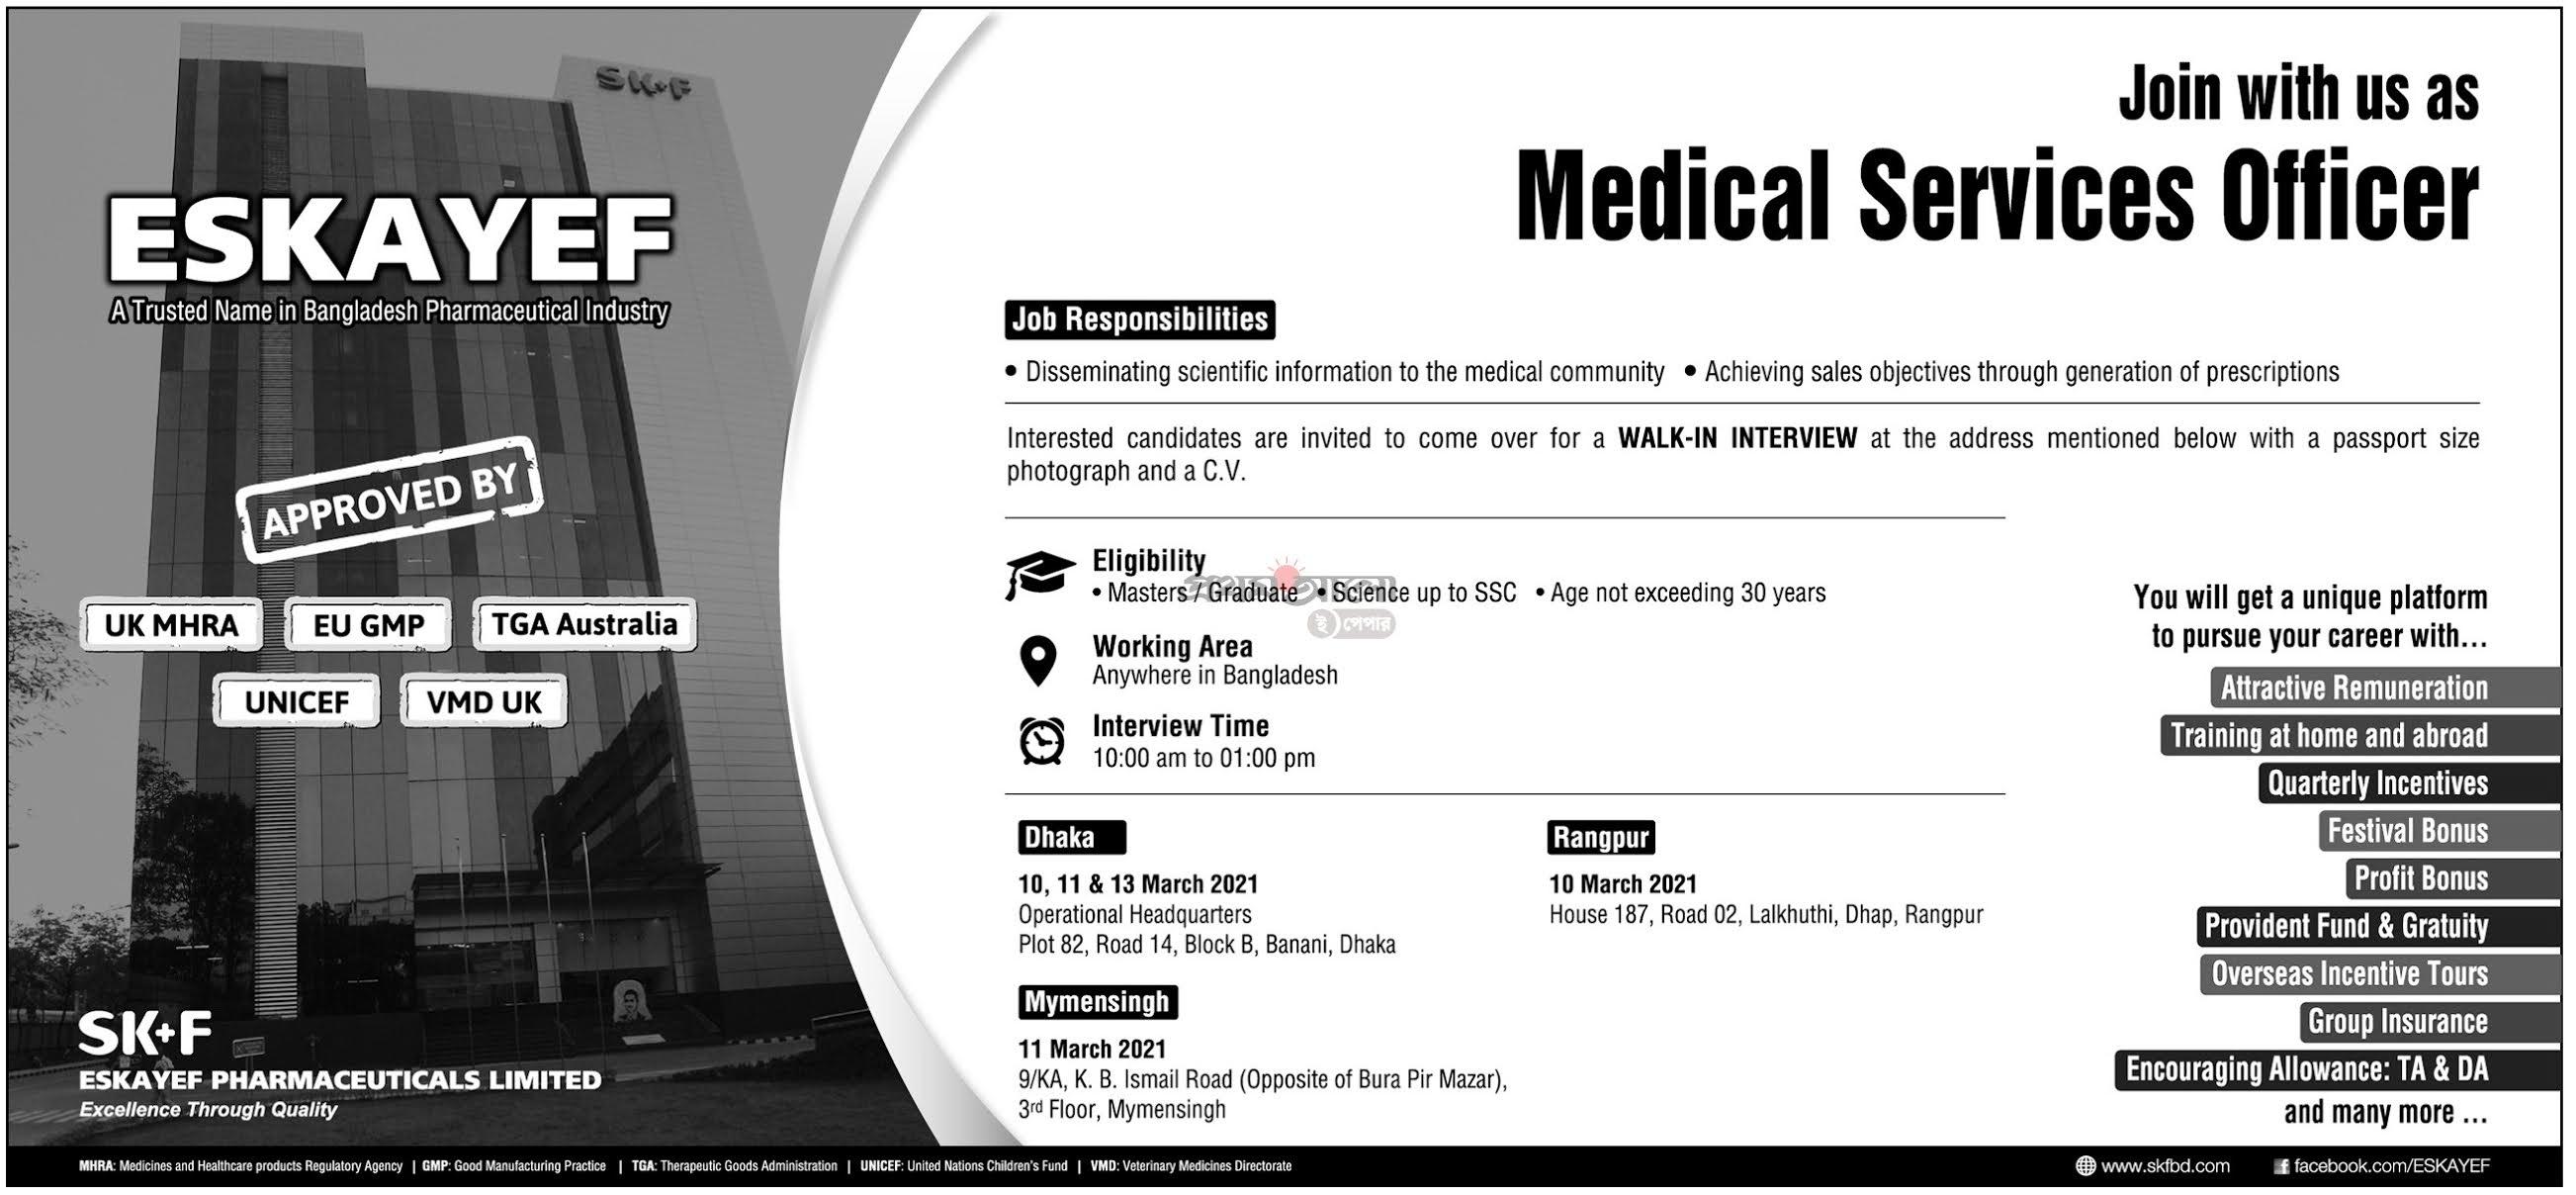 Pharmaceutical company Job circular 2021 - ঔষধ কোম্পানিতে জব সার্কুলার ২০২১ - ঔষধ কোম্পানিতে চাকরির খবর ২০২১